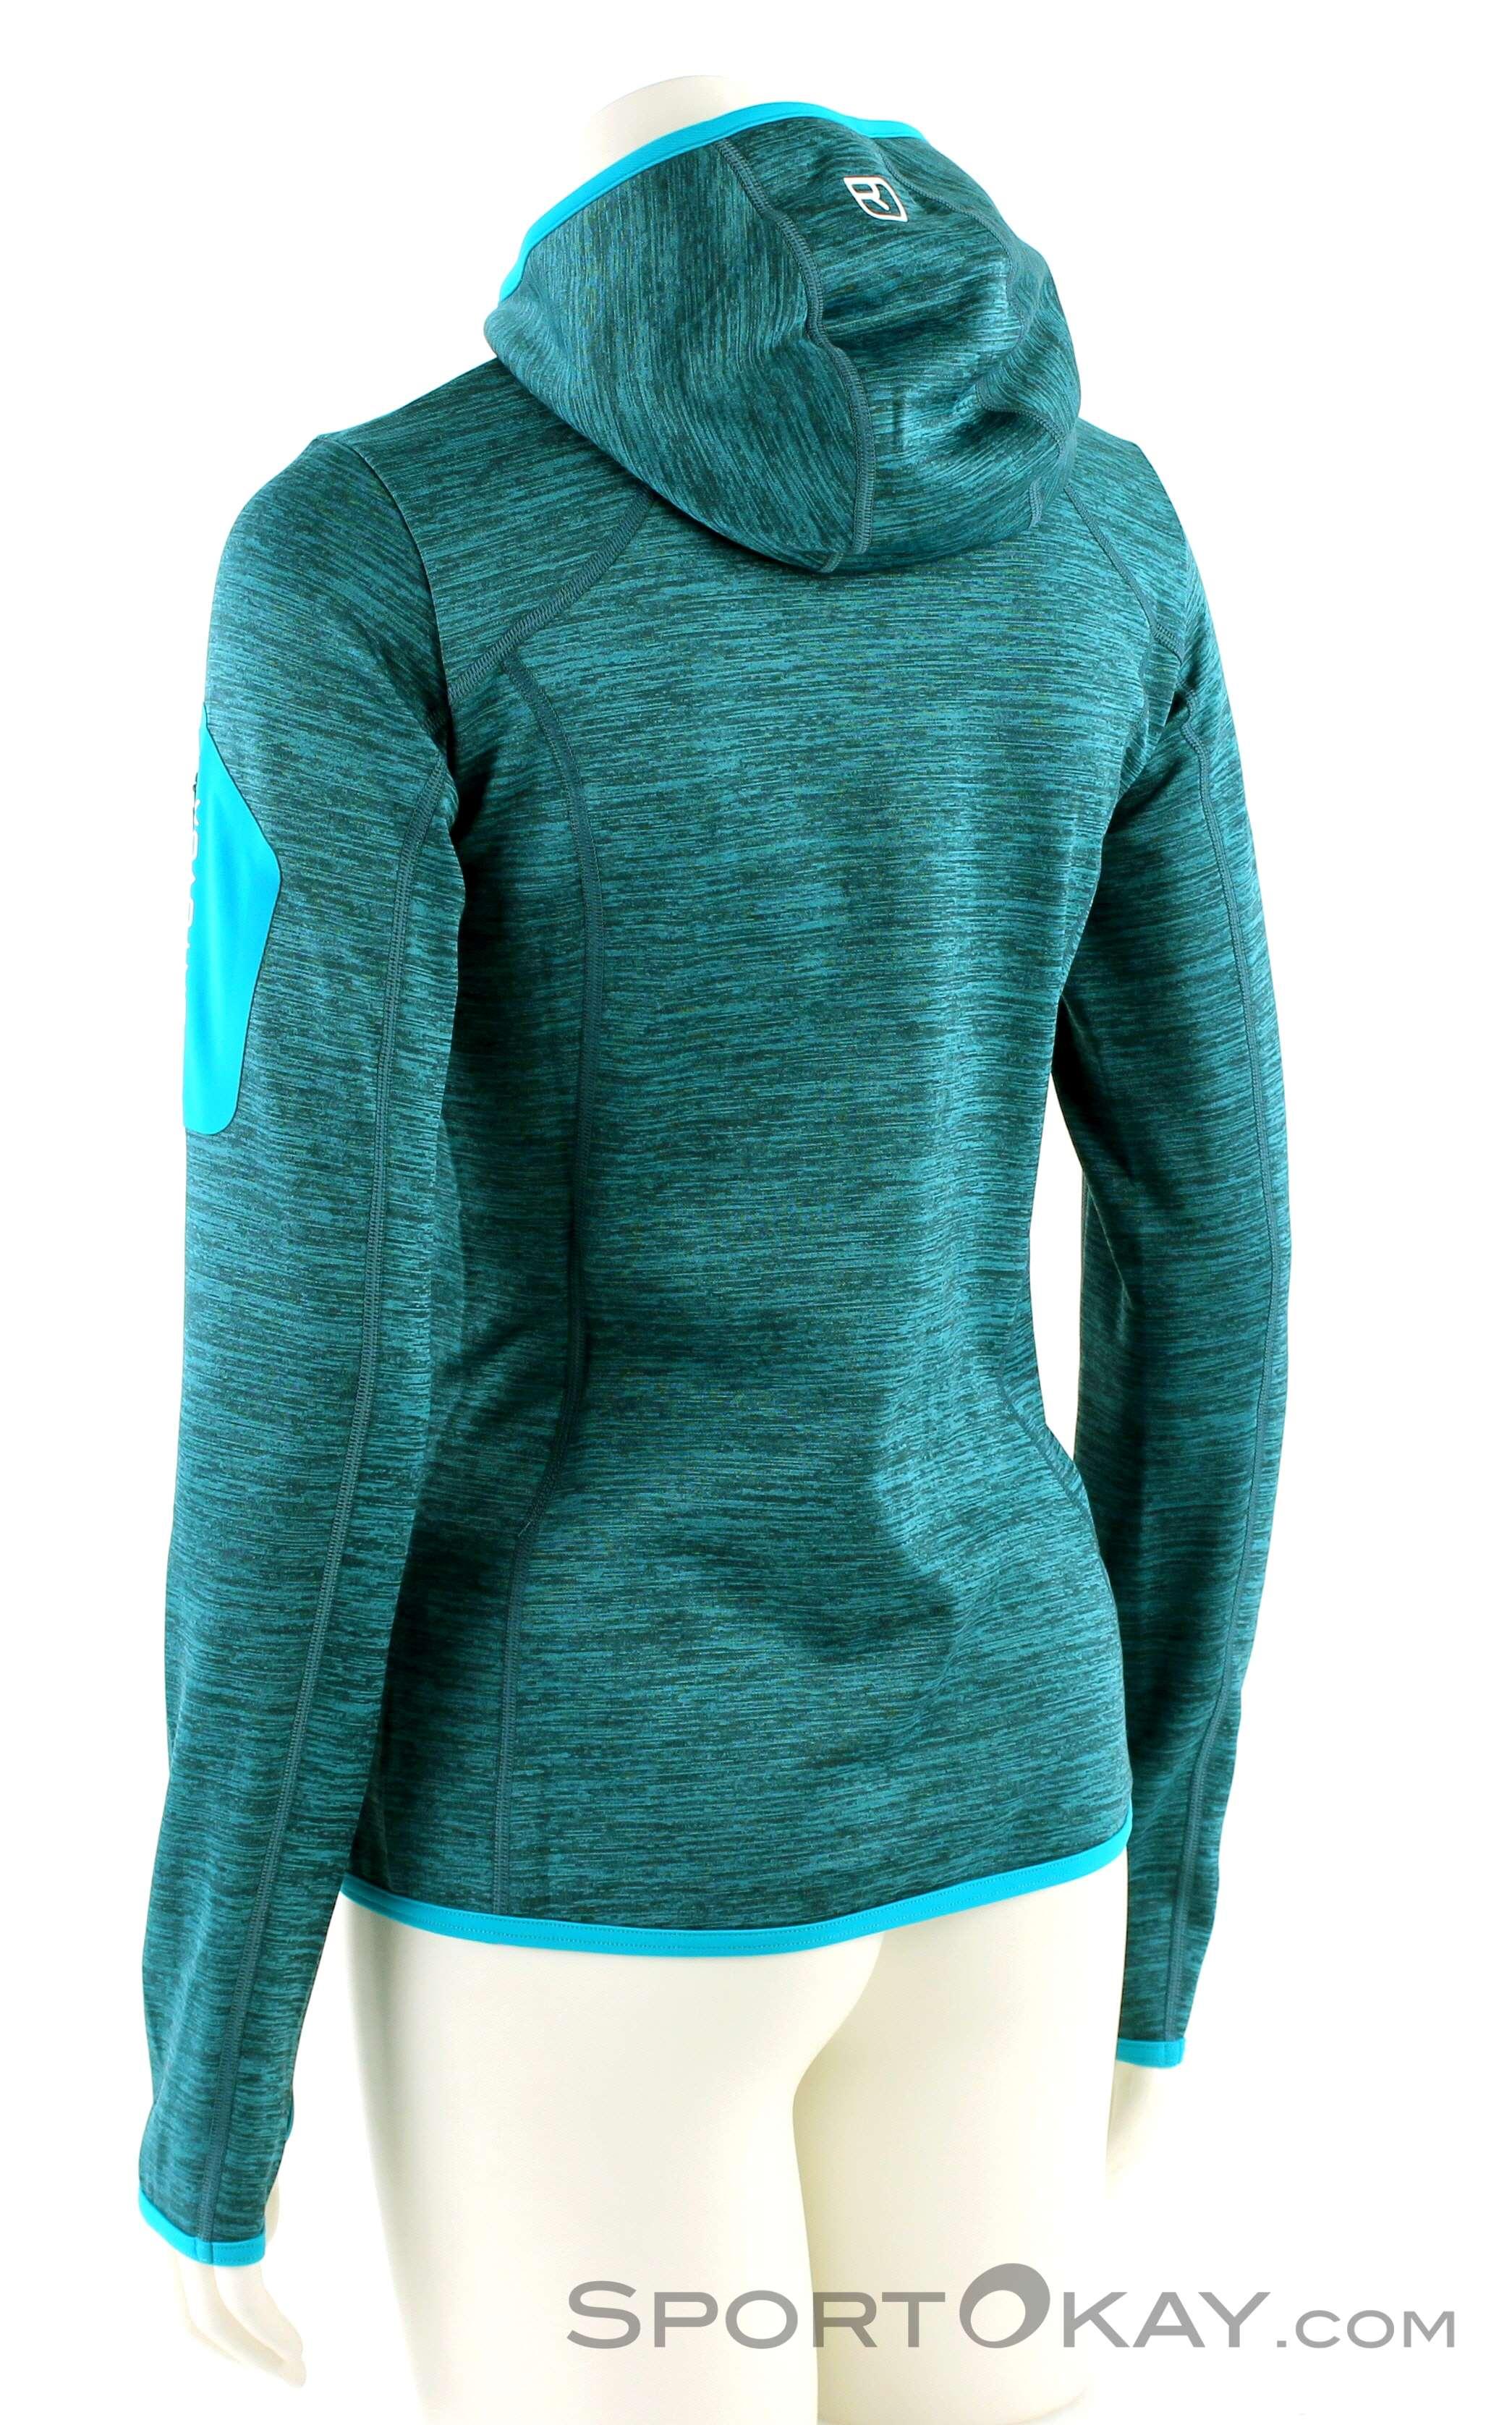 Ortovox Fleece Melange Hoody Damen Tourensweater, Ortovox, Türkis, , Damen,  0016- bbb2be1e9b